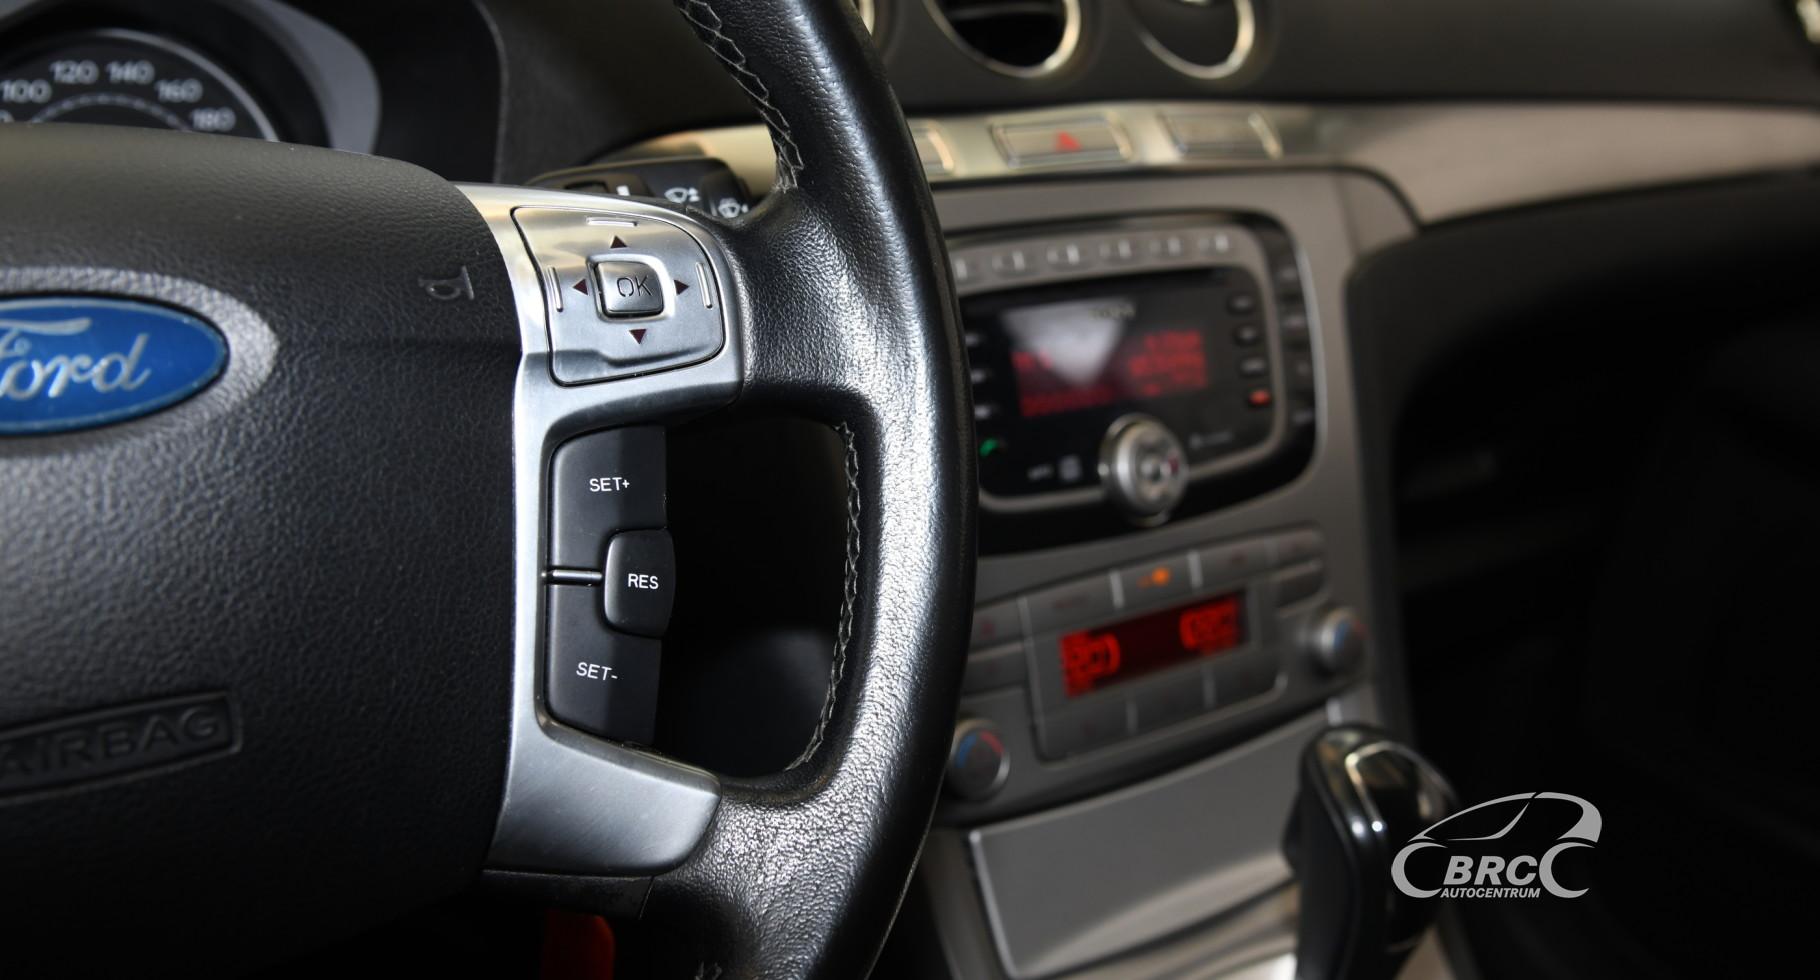 Ford S-Max 2.0TDCi Automatas